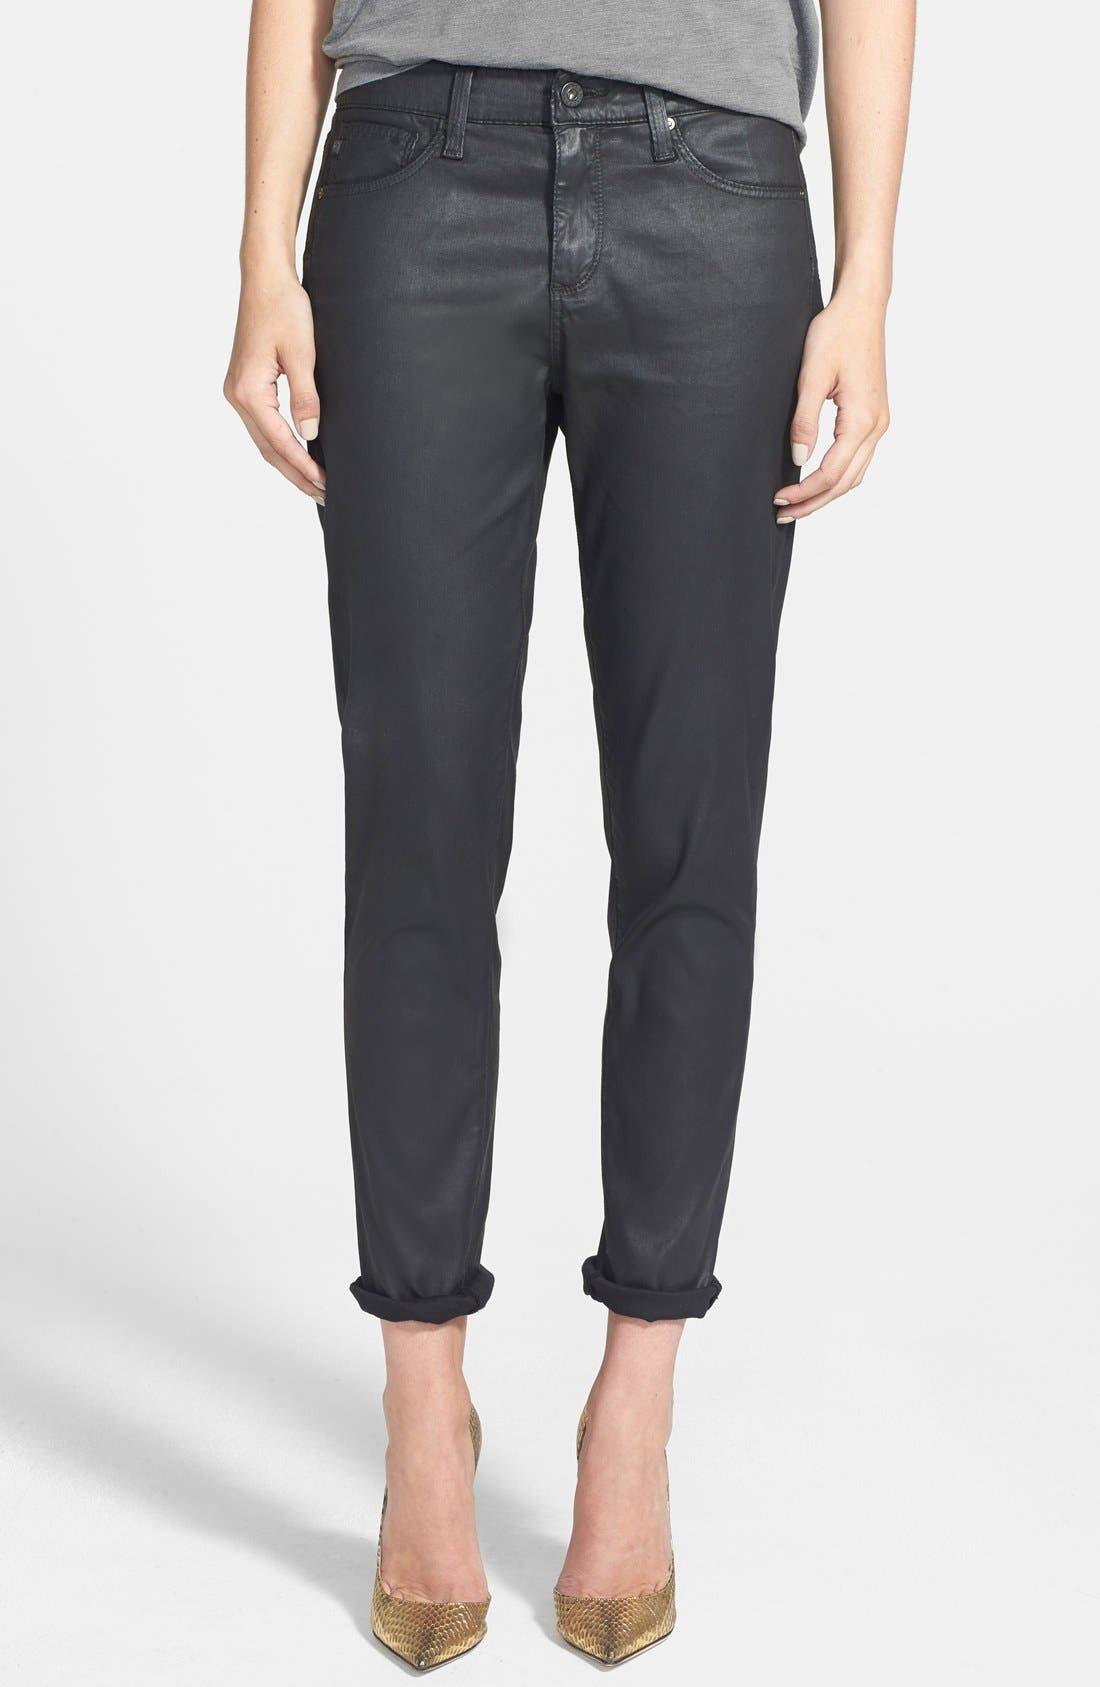 Main Image - AG 'Leatherette Beau' Coated Boyfriend Skinny Jeans (Leatherette Black)